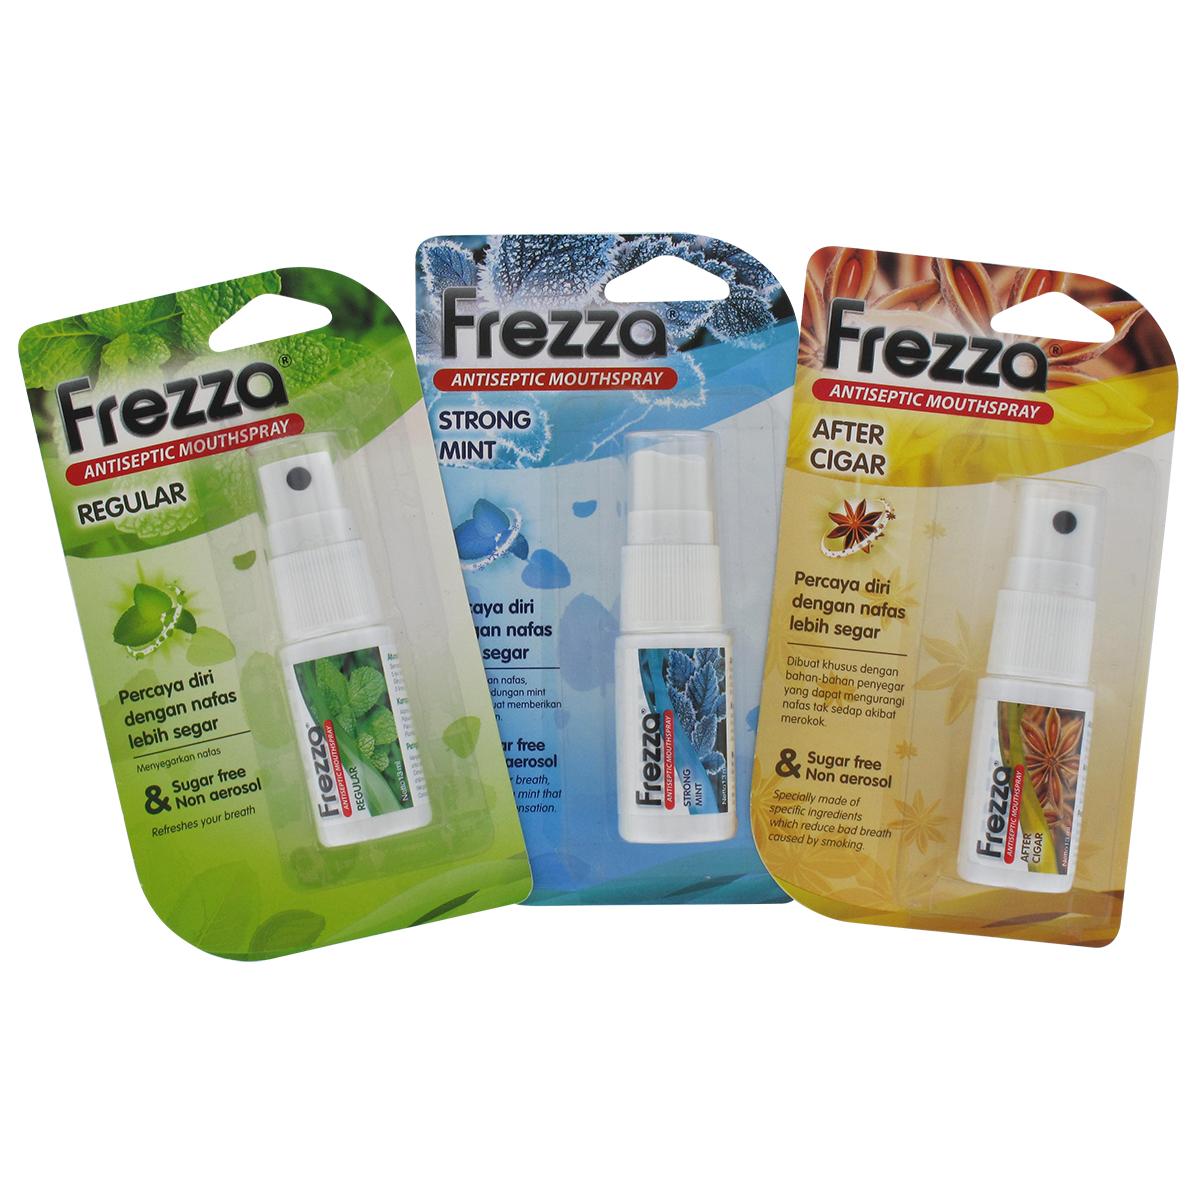 Pengharum Mulut Frezza Mouth Spray Penghilang Bau Mulut Lazada